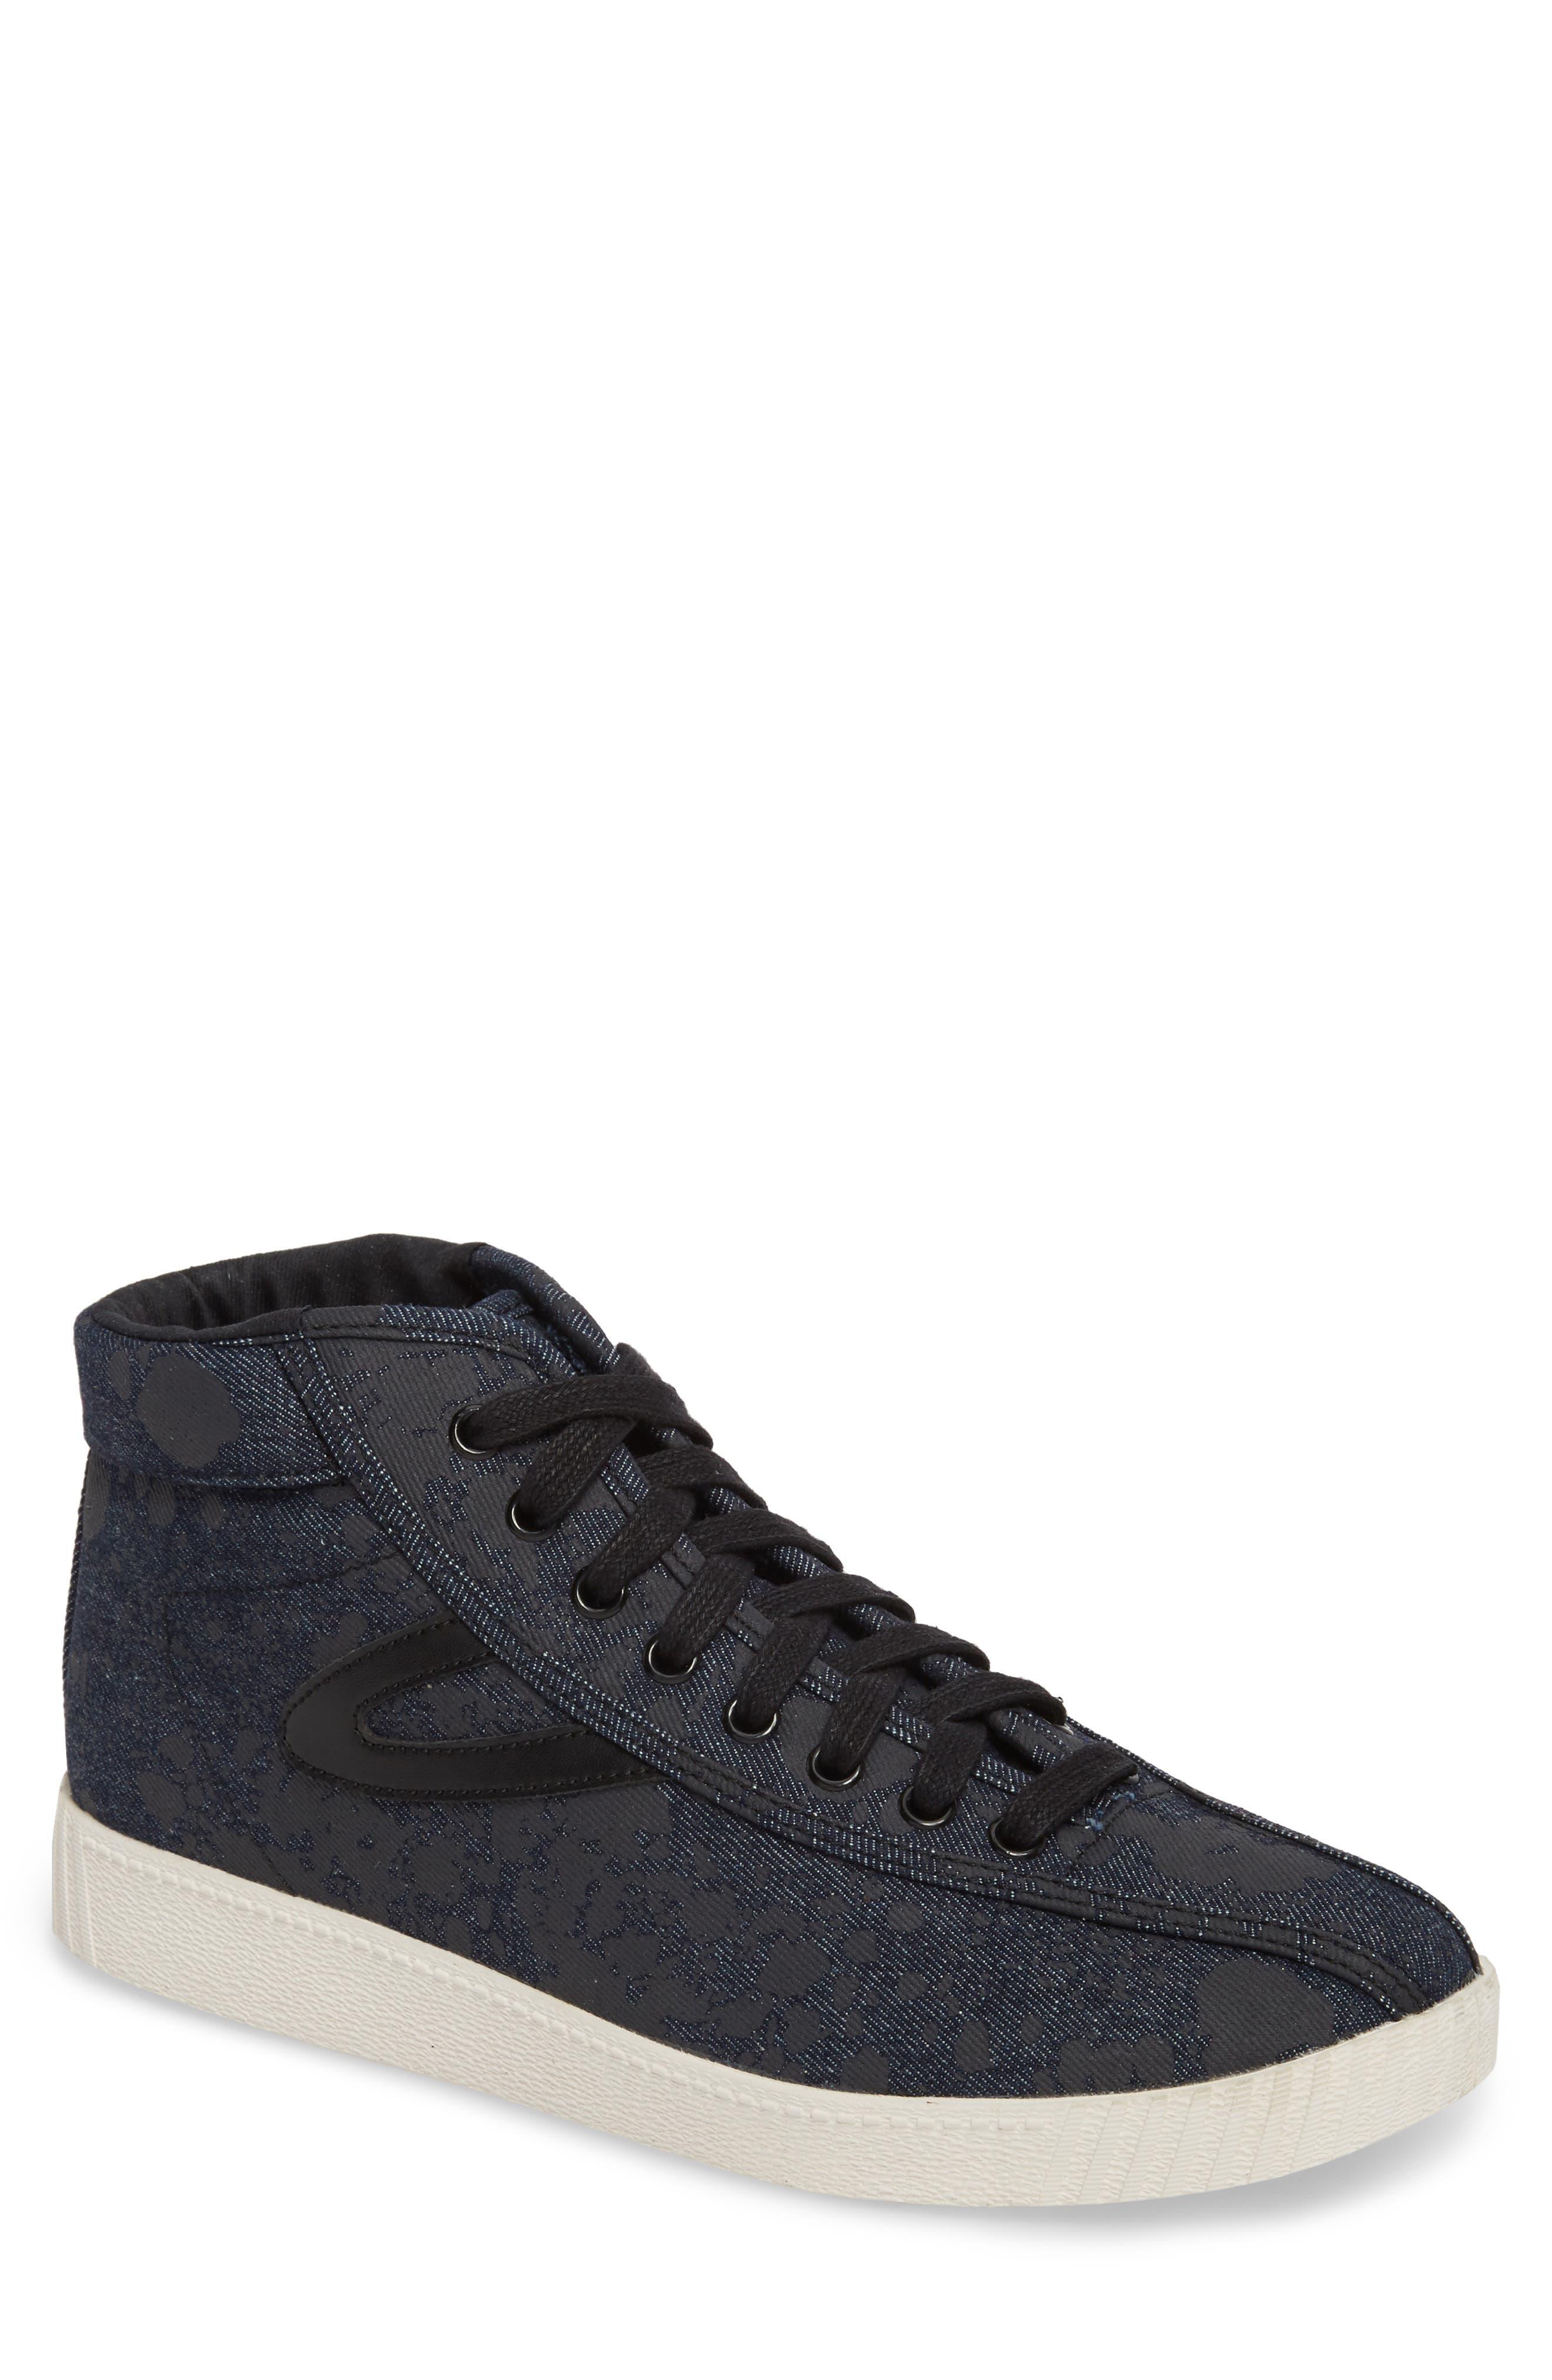 Nylite High Top Sneaker,                         Main,                         color, Nero Opaco/ Black Denim